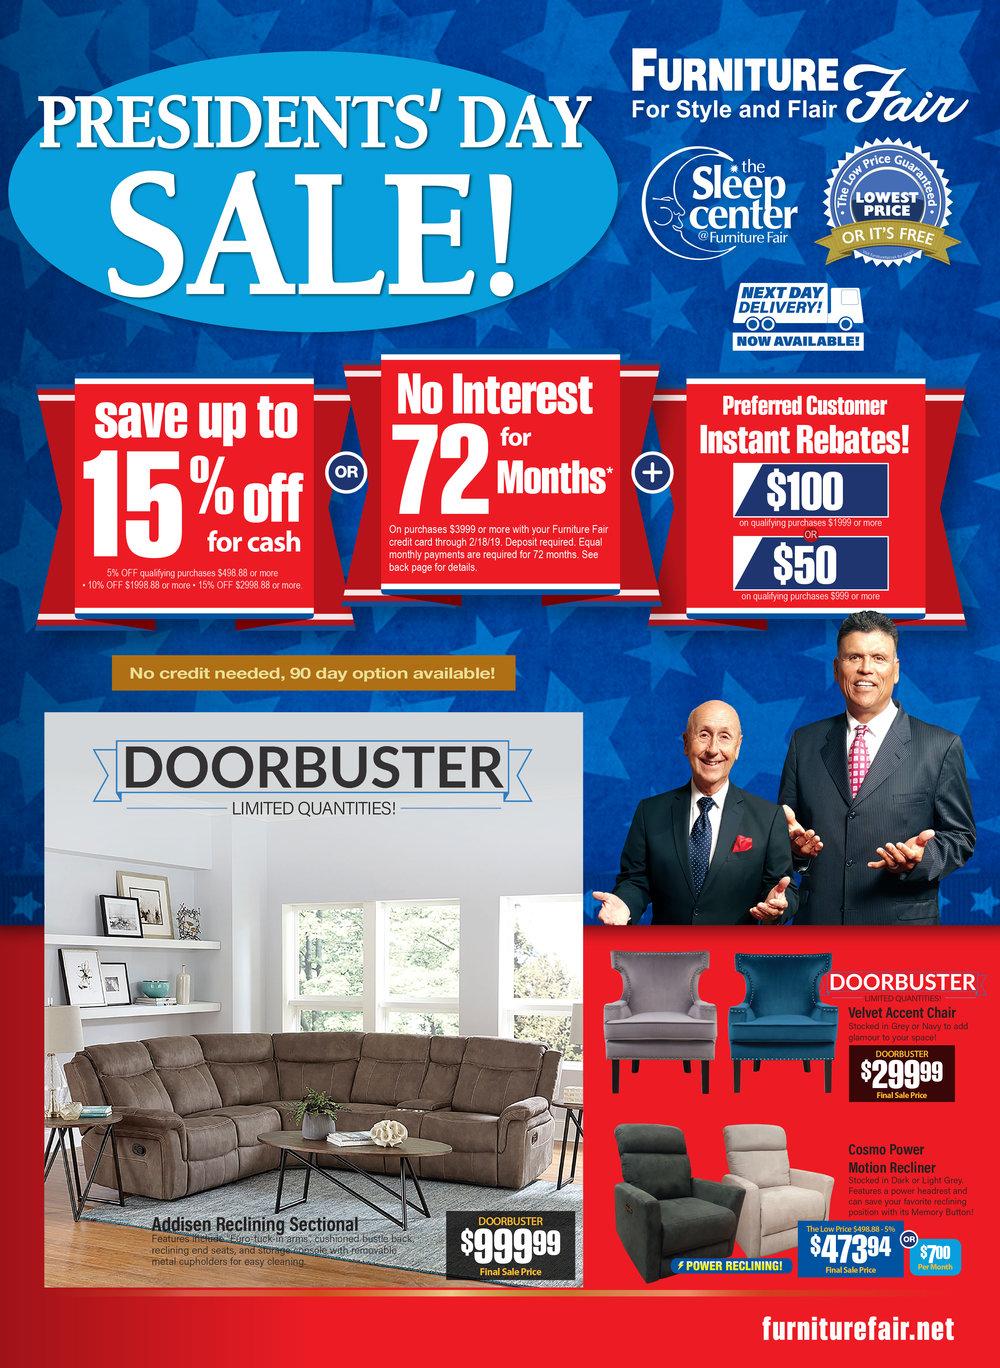 #3_19-2112 FF_Presidents Day Sale Mailer.jpg